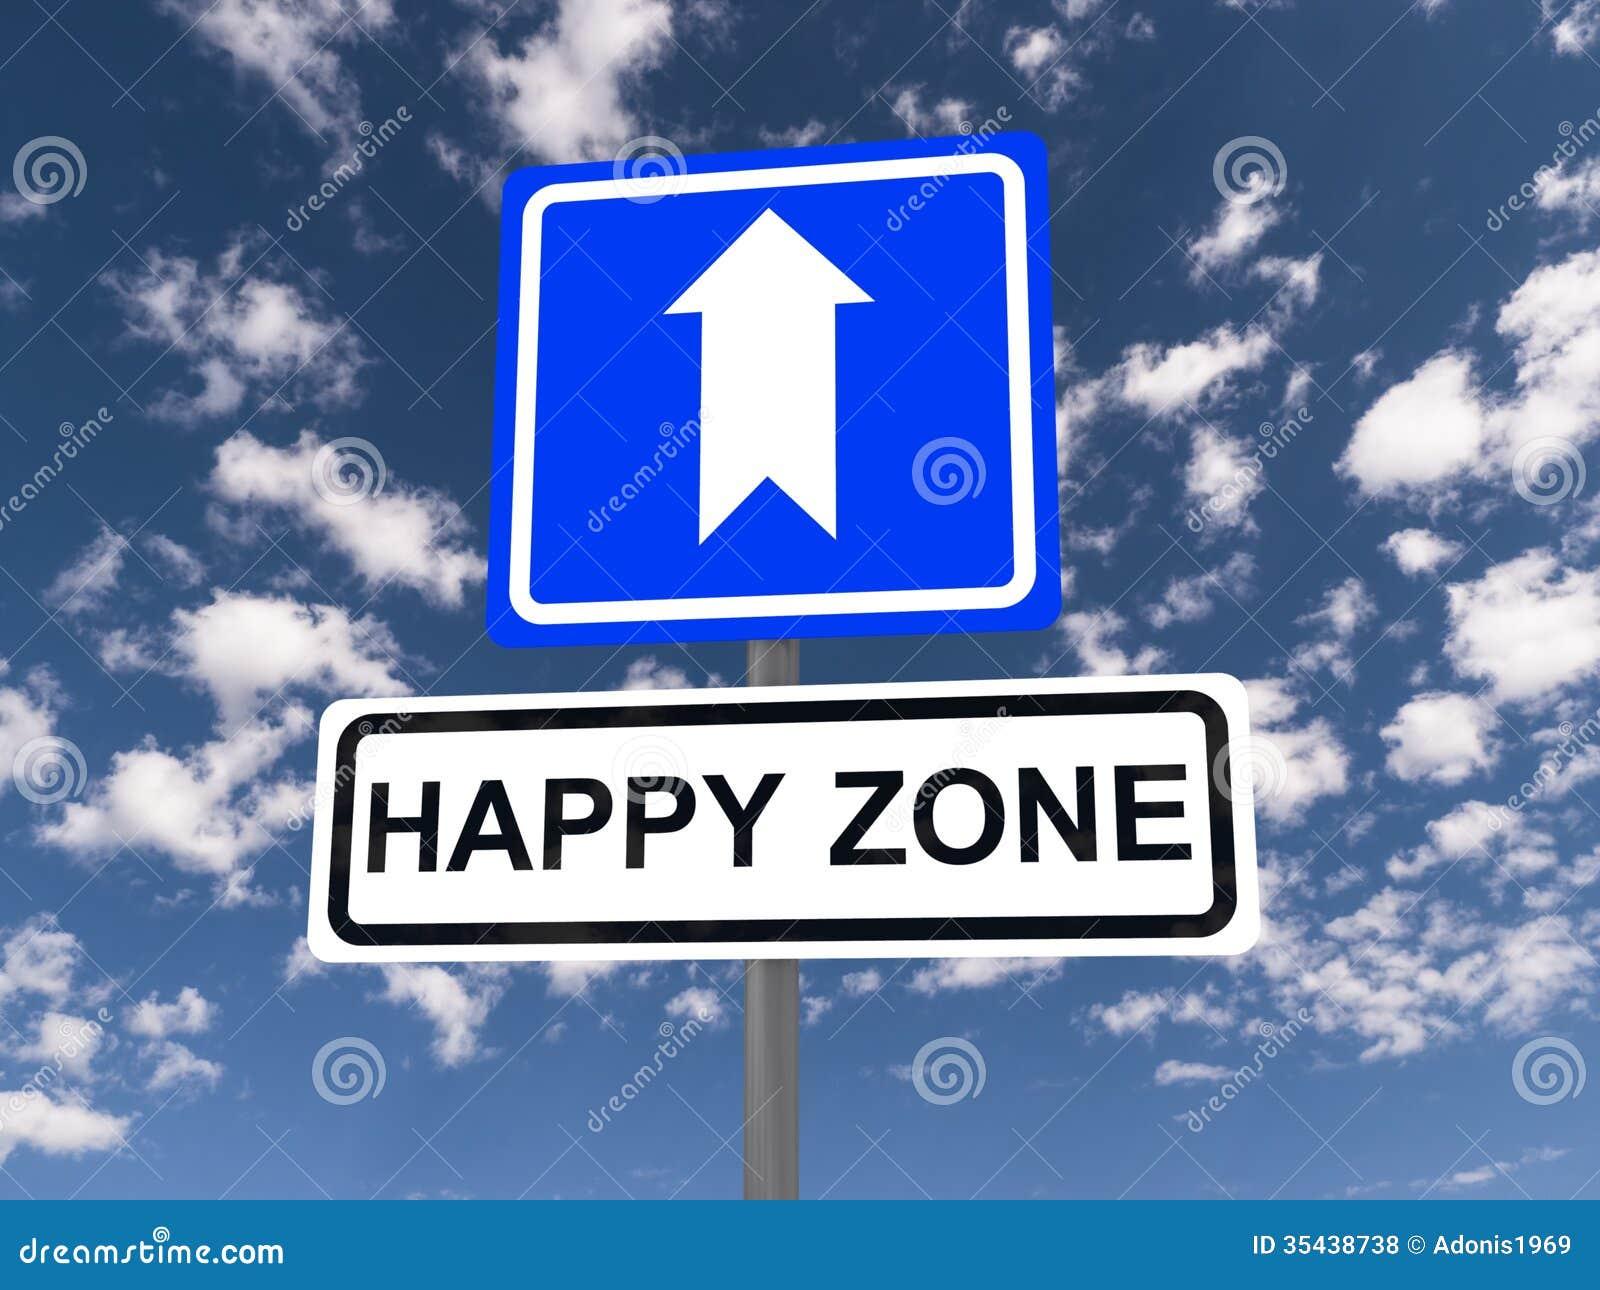 Turn around sign stock image image 35488961 - Happy Zone Sign Royalty Free Stock Photos